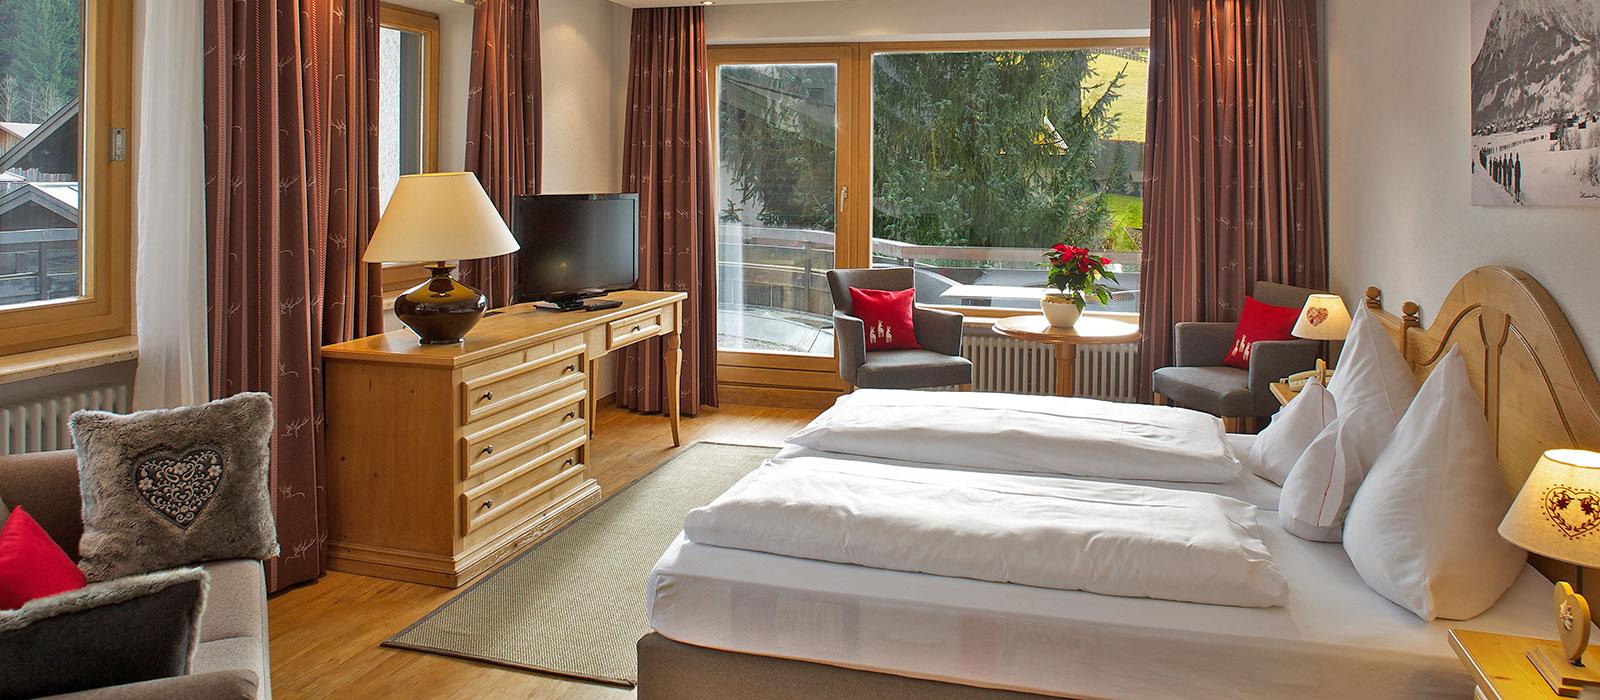 Sporthotel Menning - Hotel in Oberstdorf im Allgäu